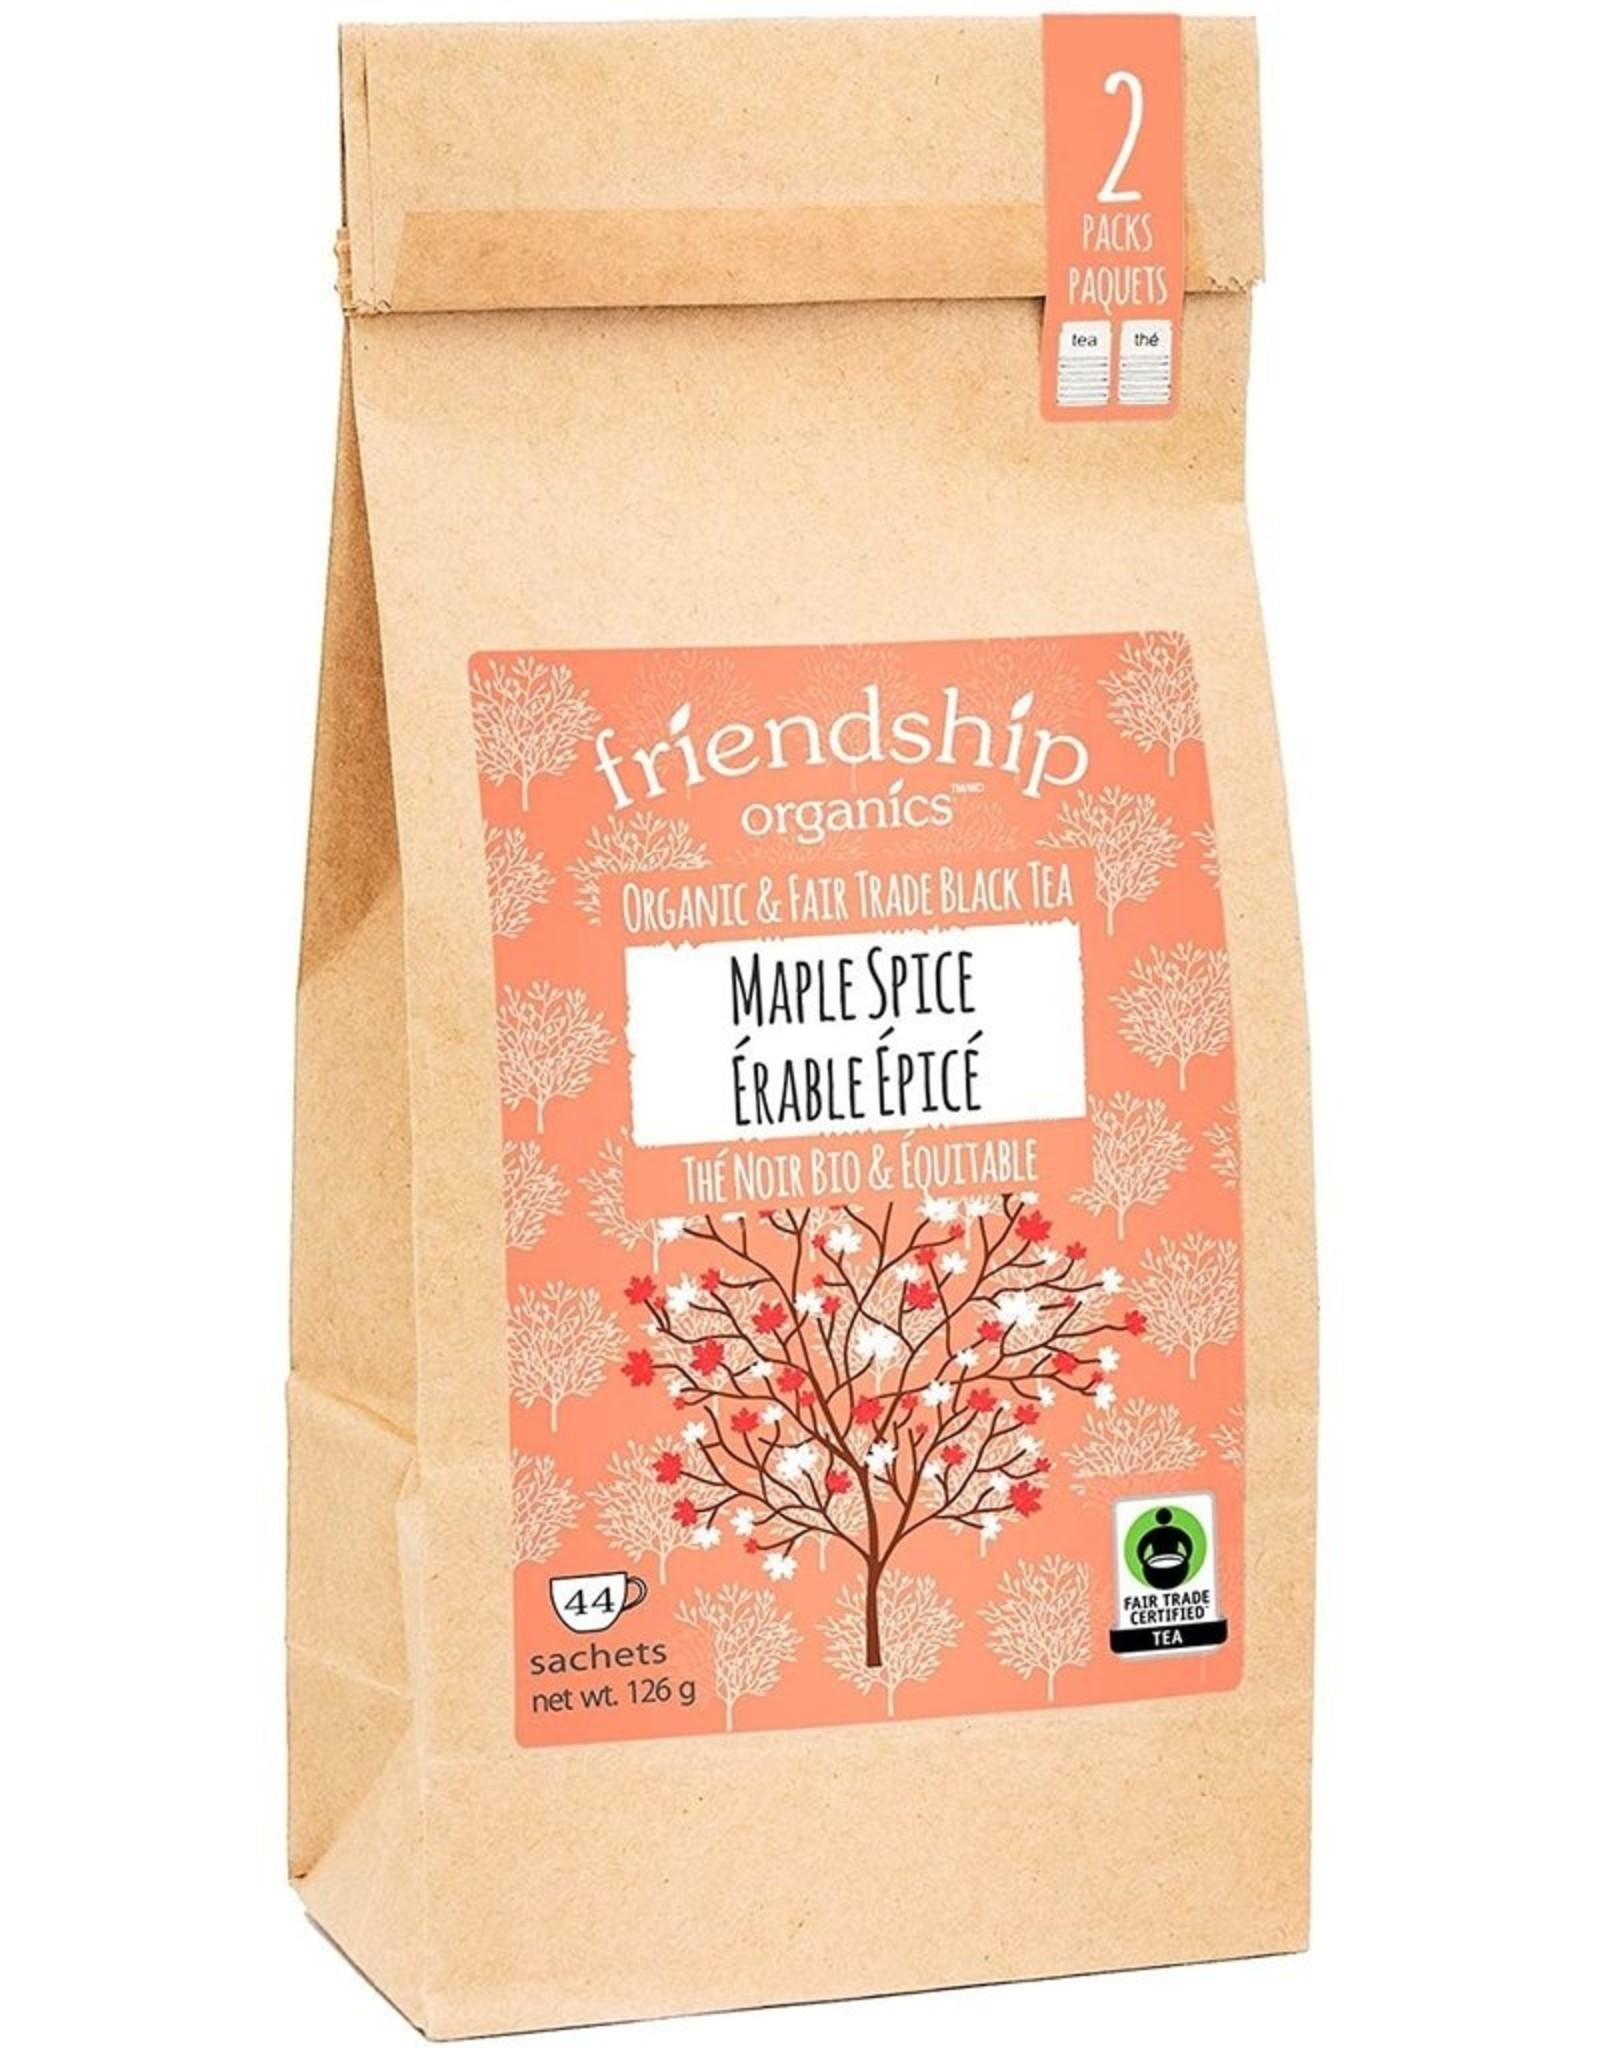 Friendship Organics Friendship Organics Maple Spice Black Tea Twin Pack